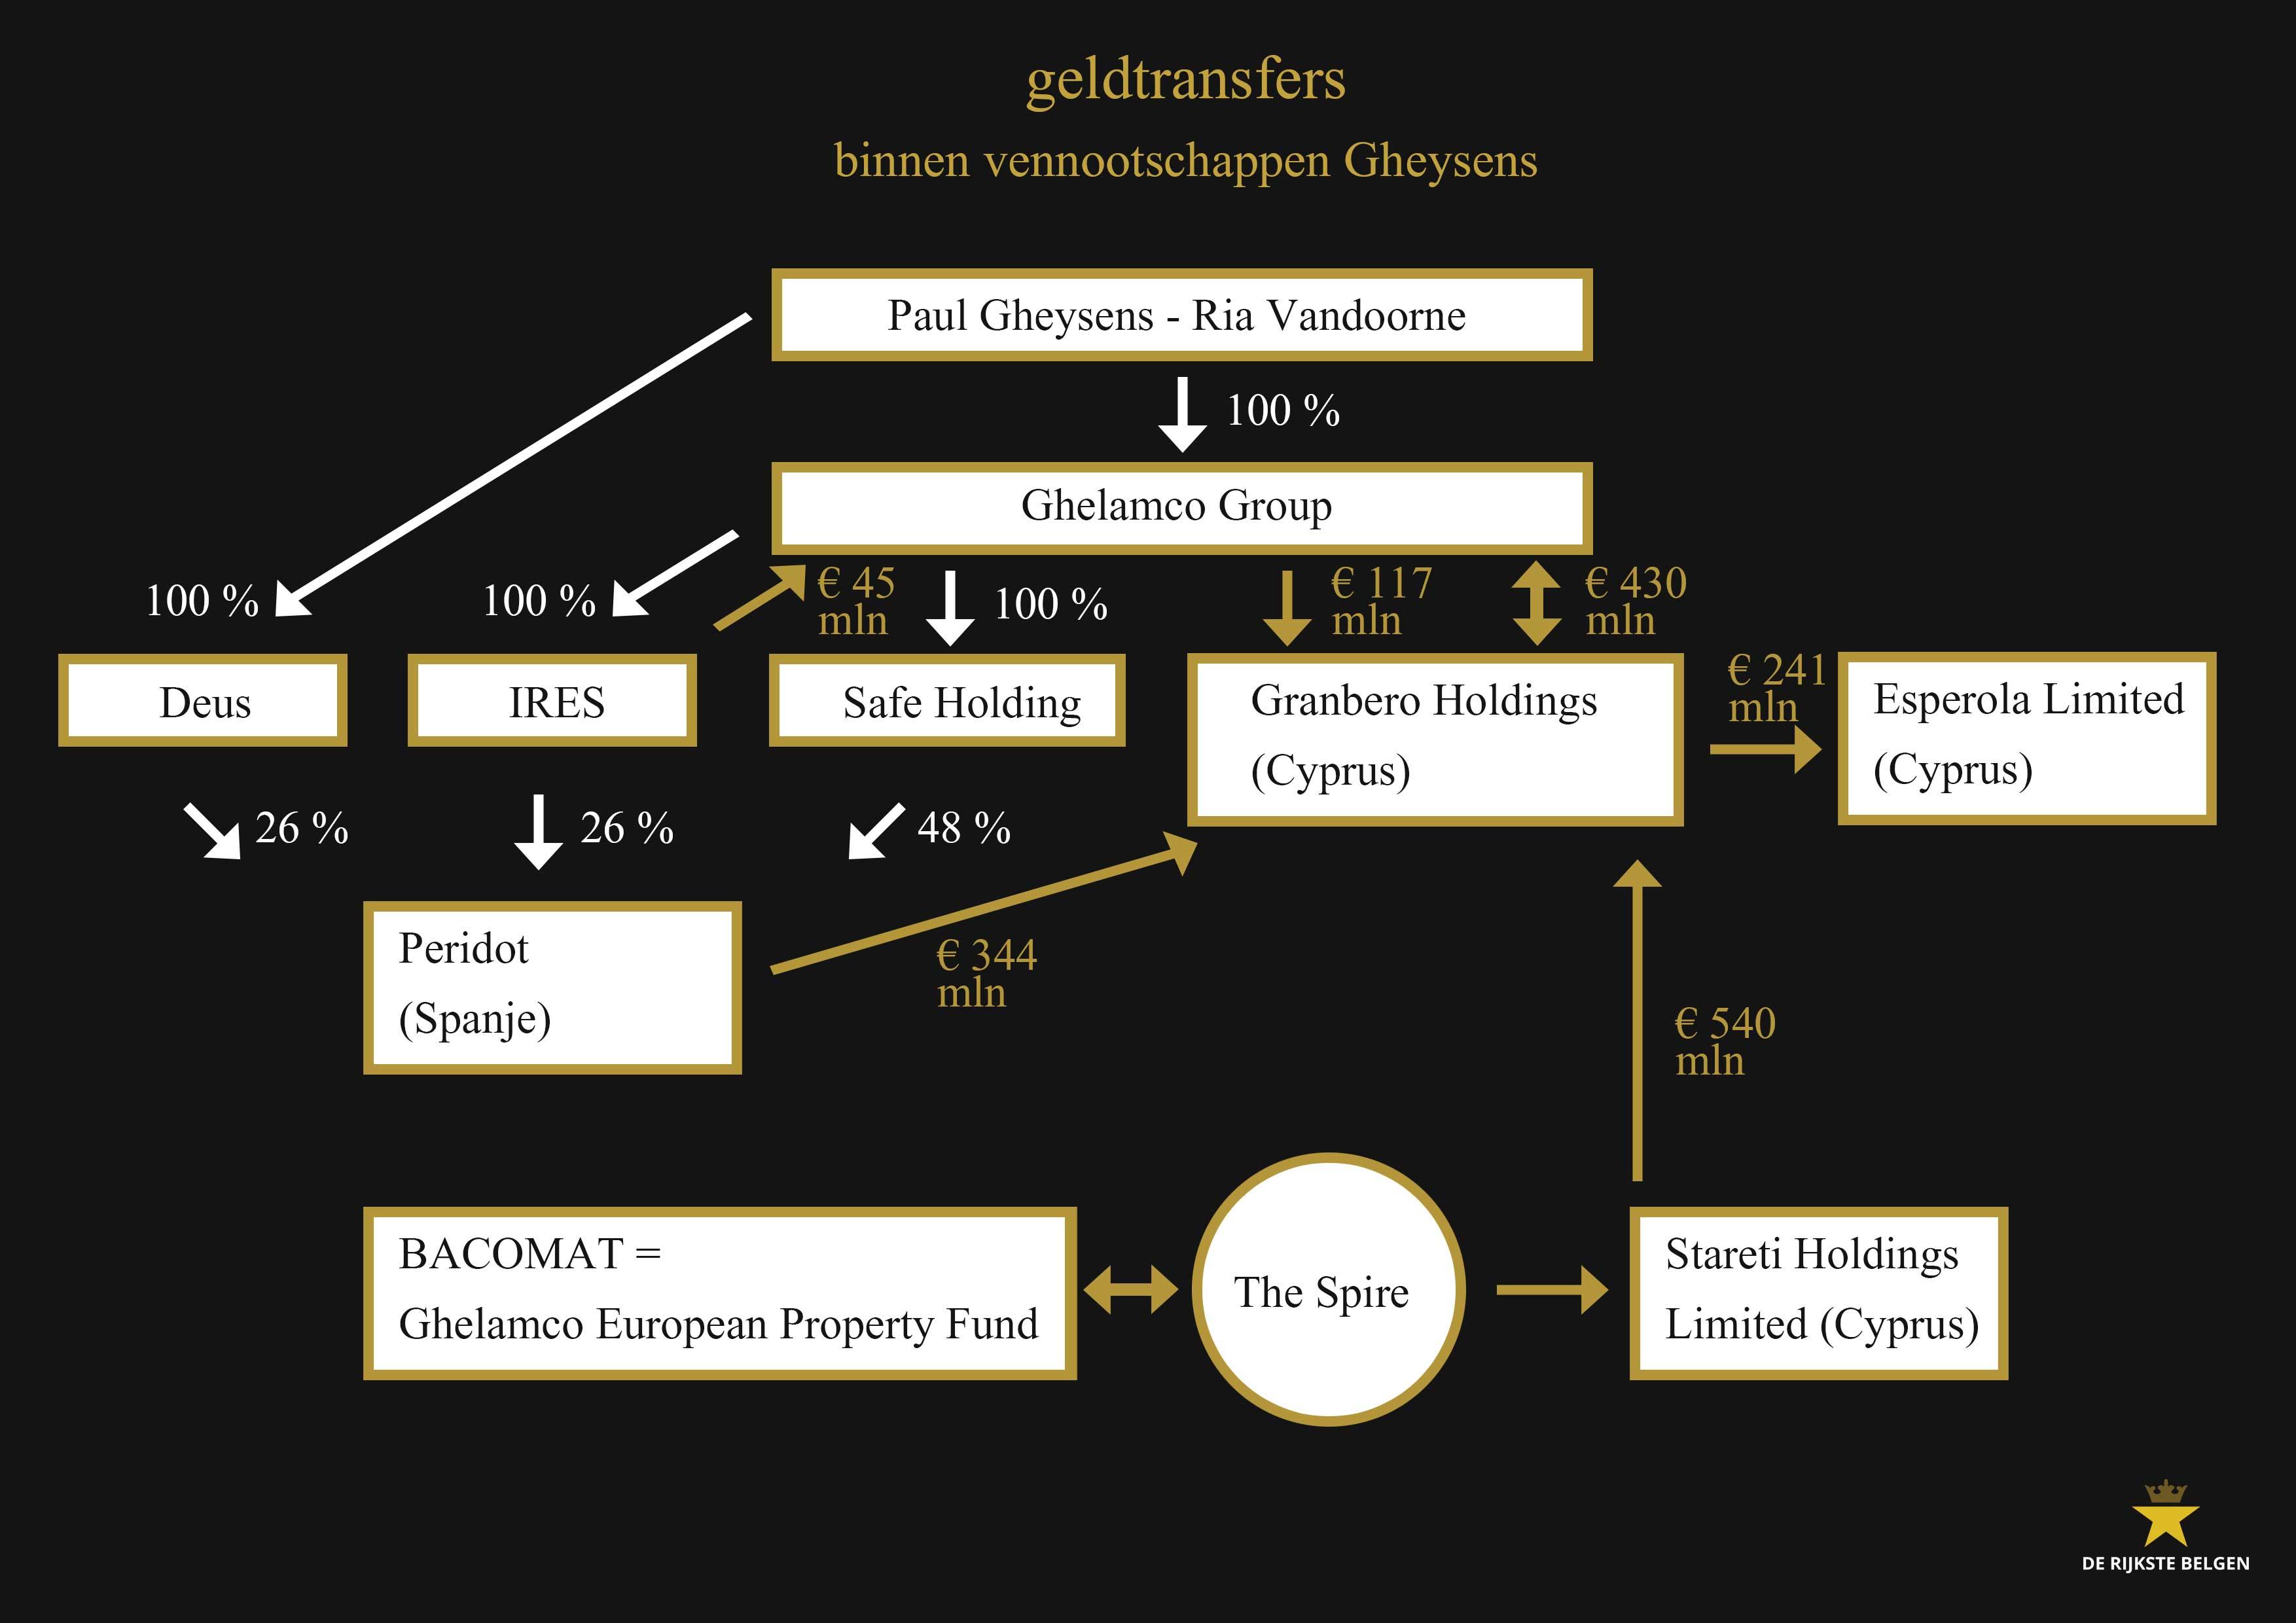 Geldtransfers vennootschappen Paul Gheysens - Ghelamco